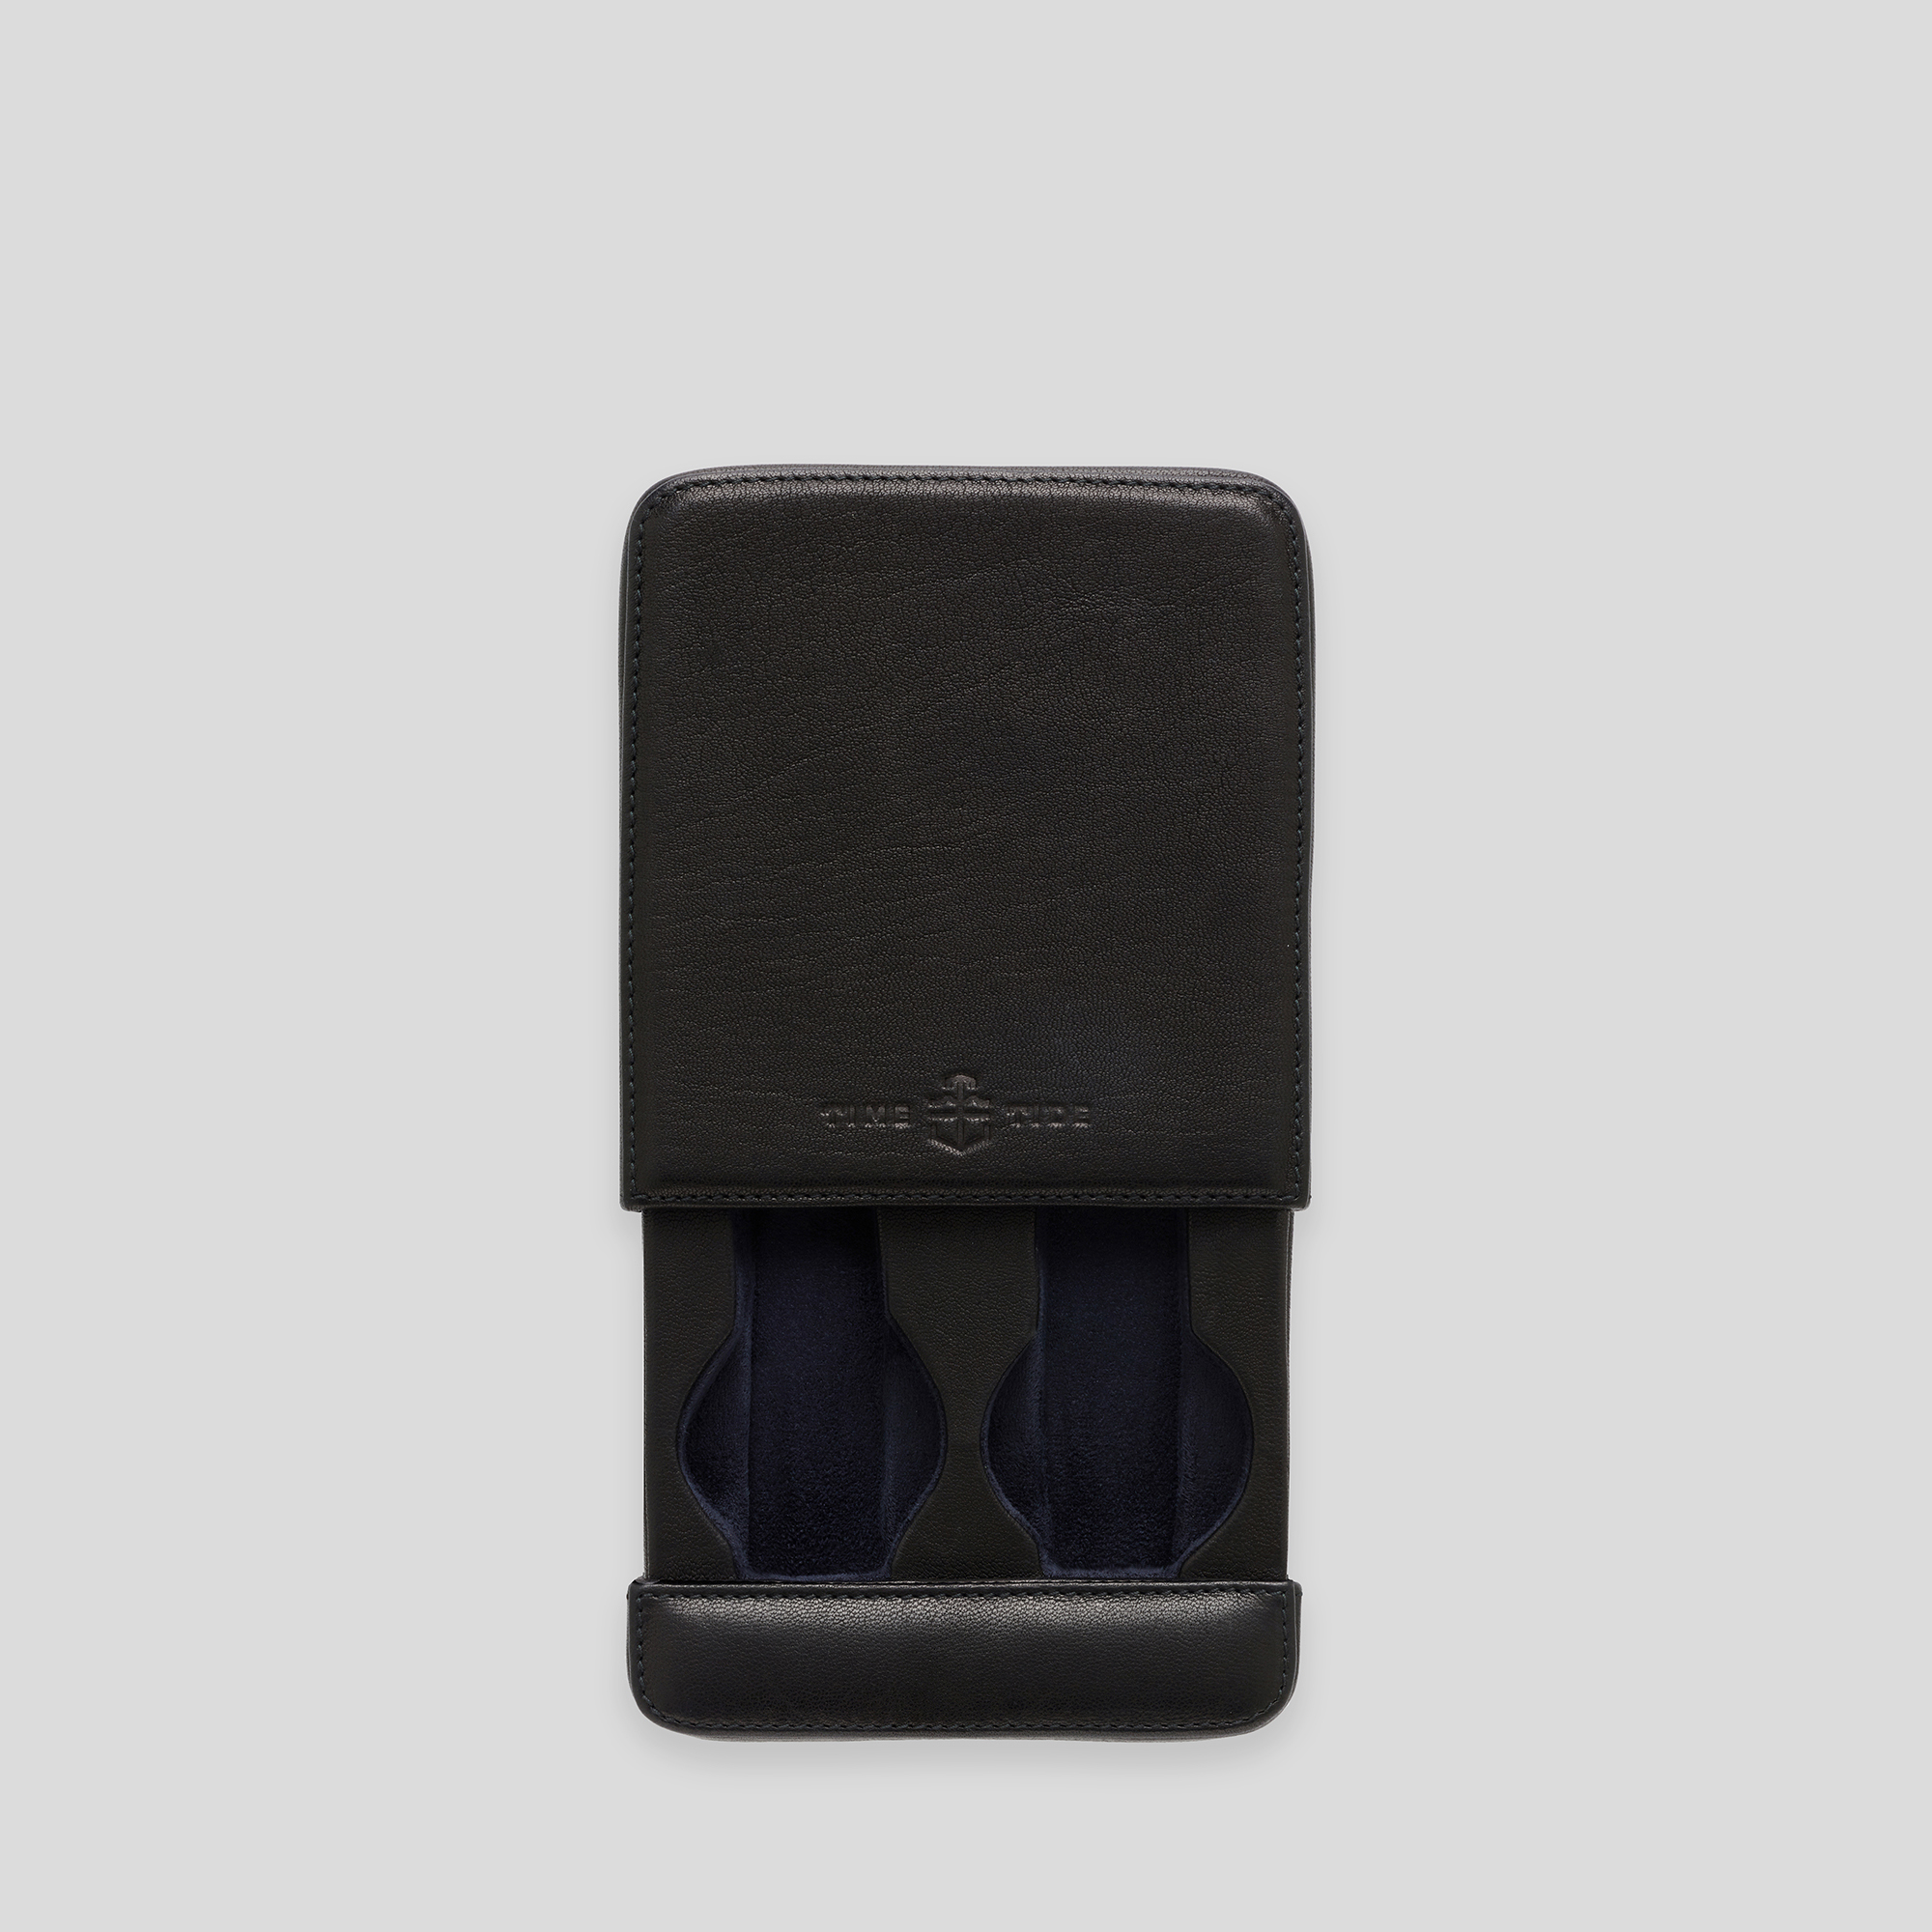 Black leather two watch slider box storage